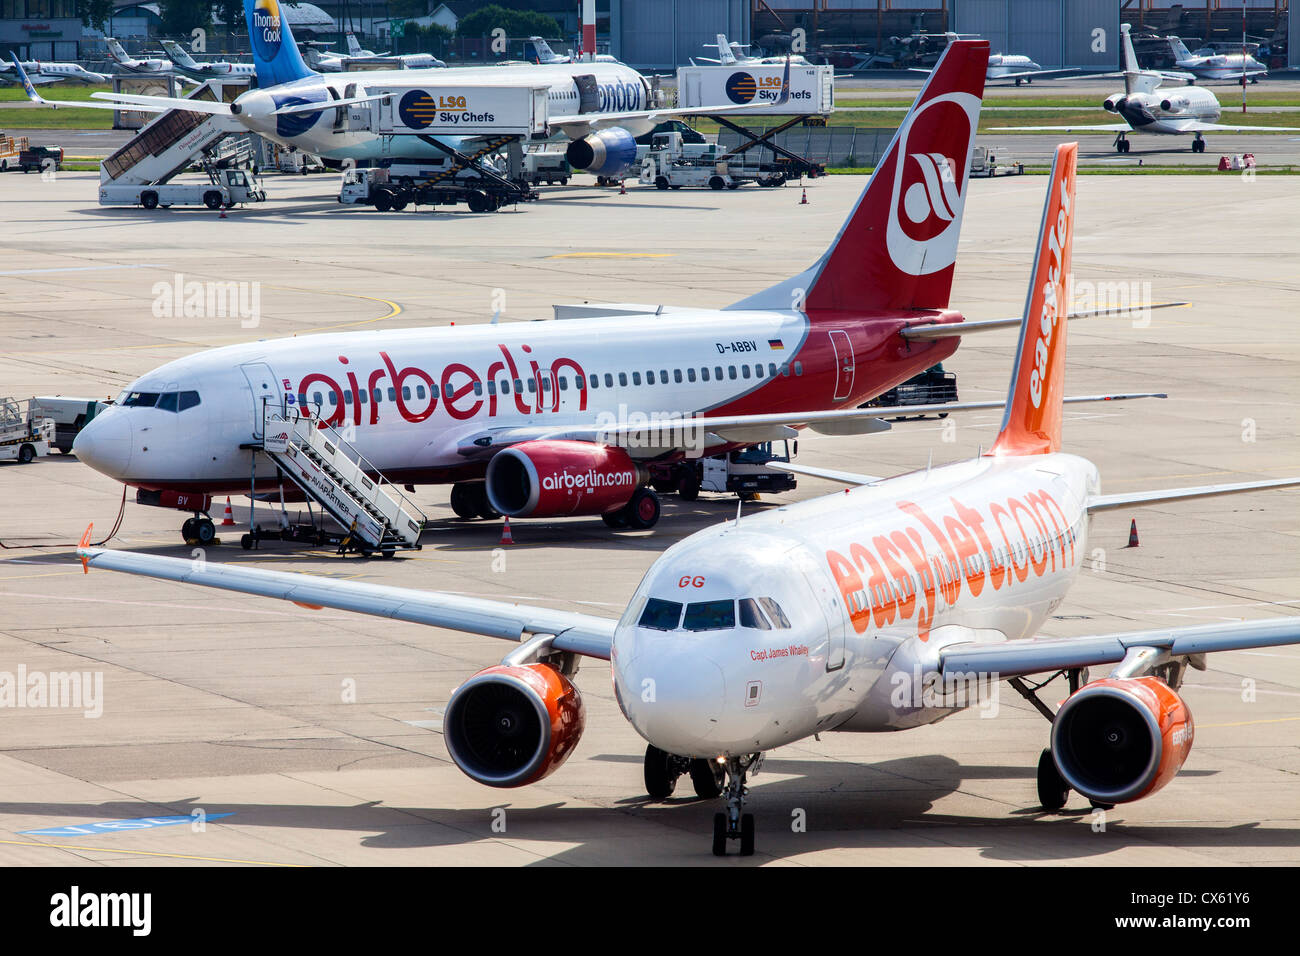 Ground traffic of air planes at Düsseldorf International Airport. Germany, Europe. - Stock Image